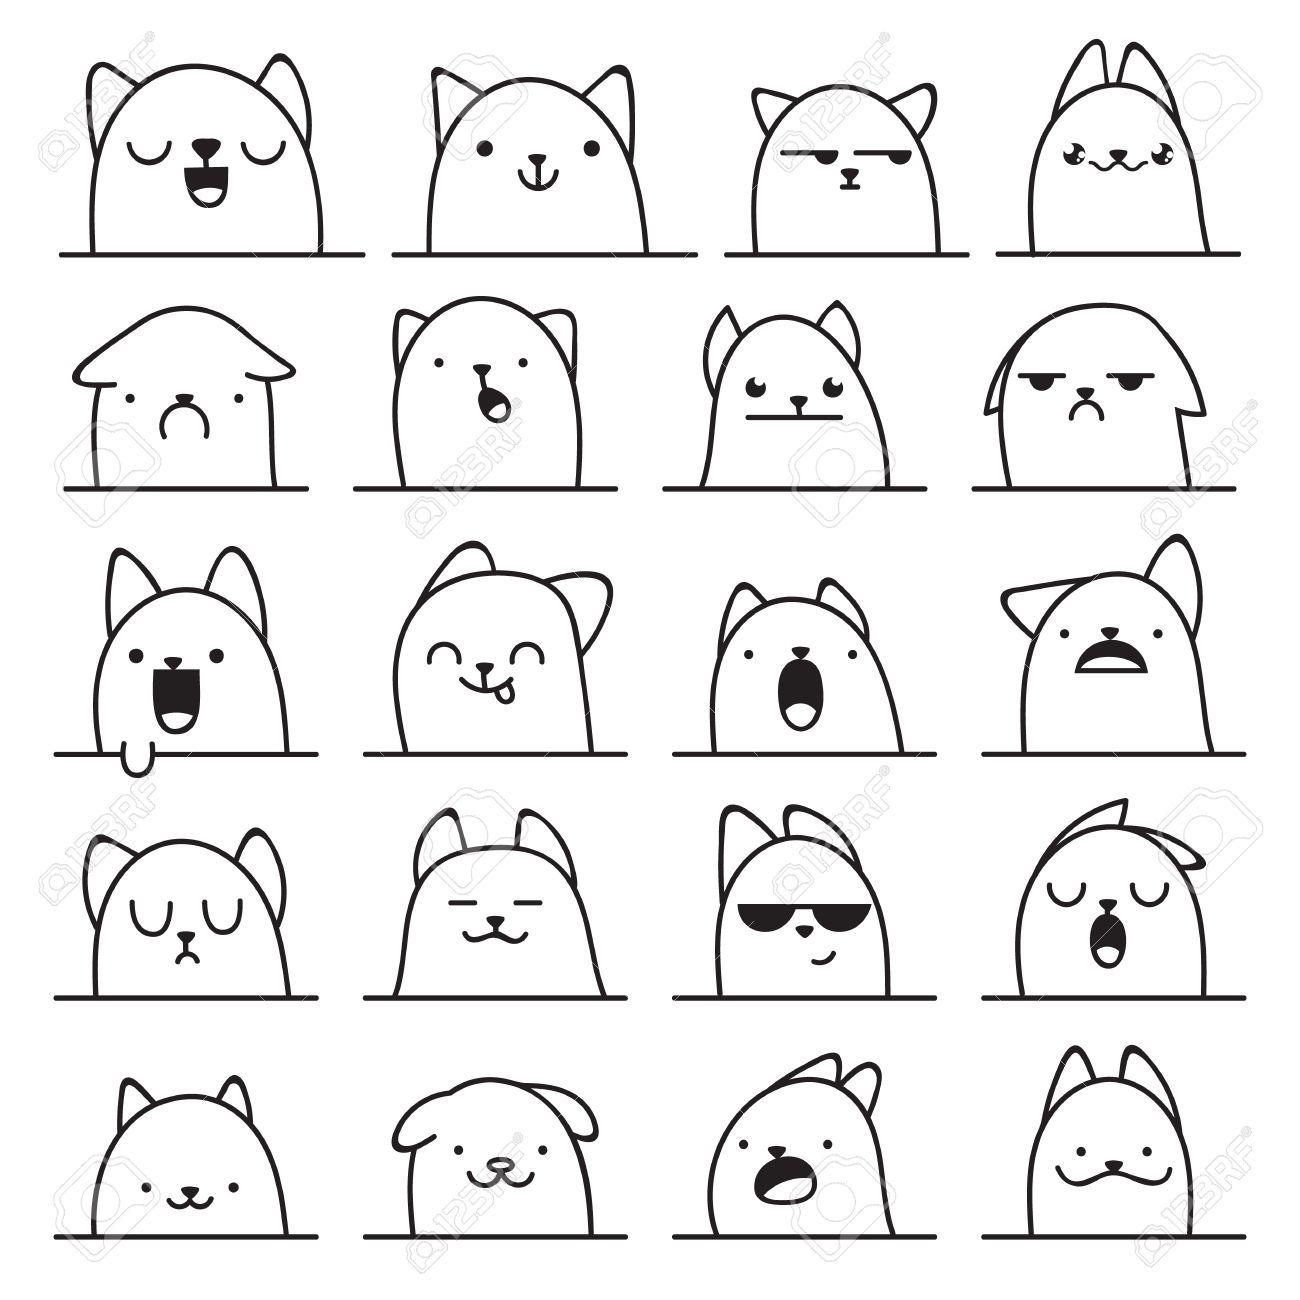 43908191-Set-of-20-different-doodle-emotions-cat-Emotions ...